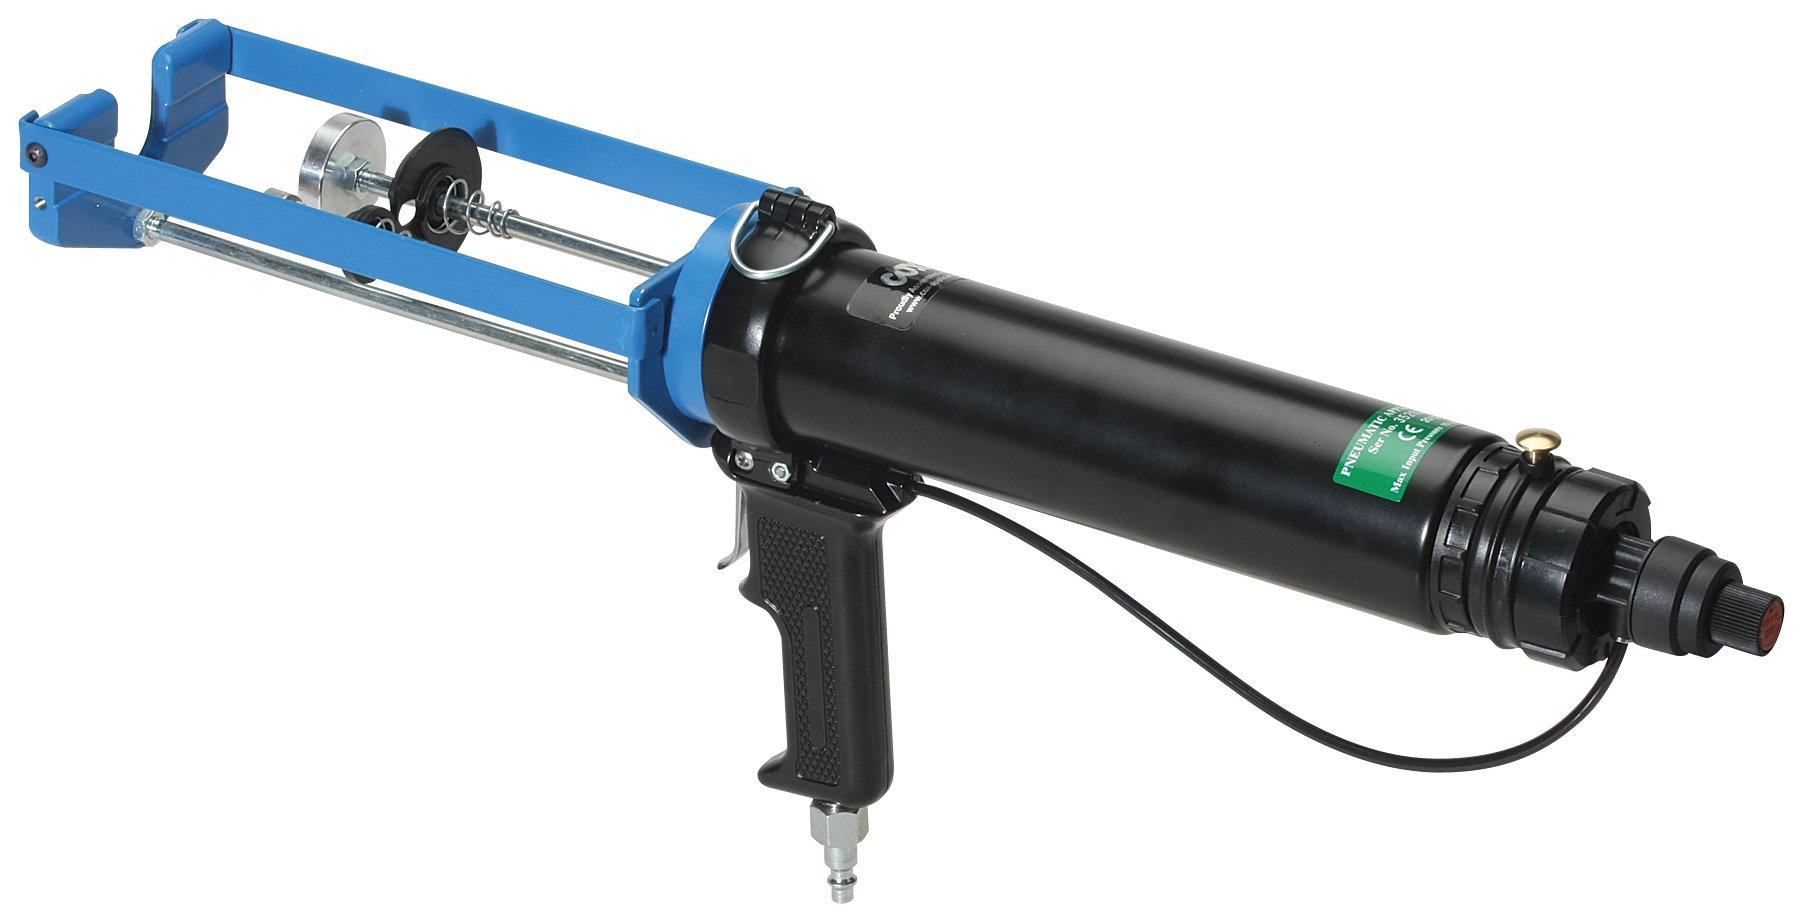 COX A300LP MR 300 ml. x 300 ml. Multi Ratio Pneumatic Epoxy Applicator